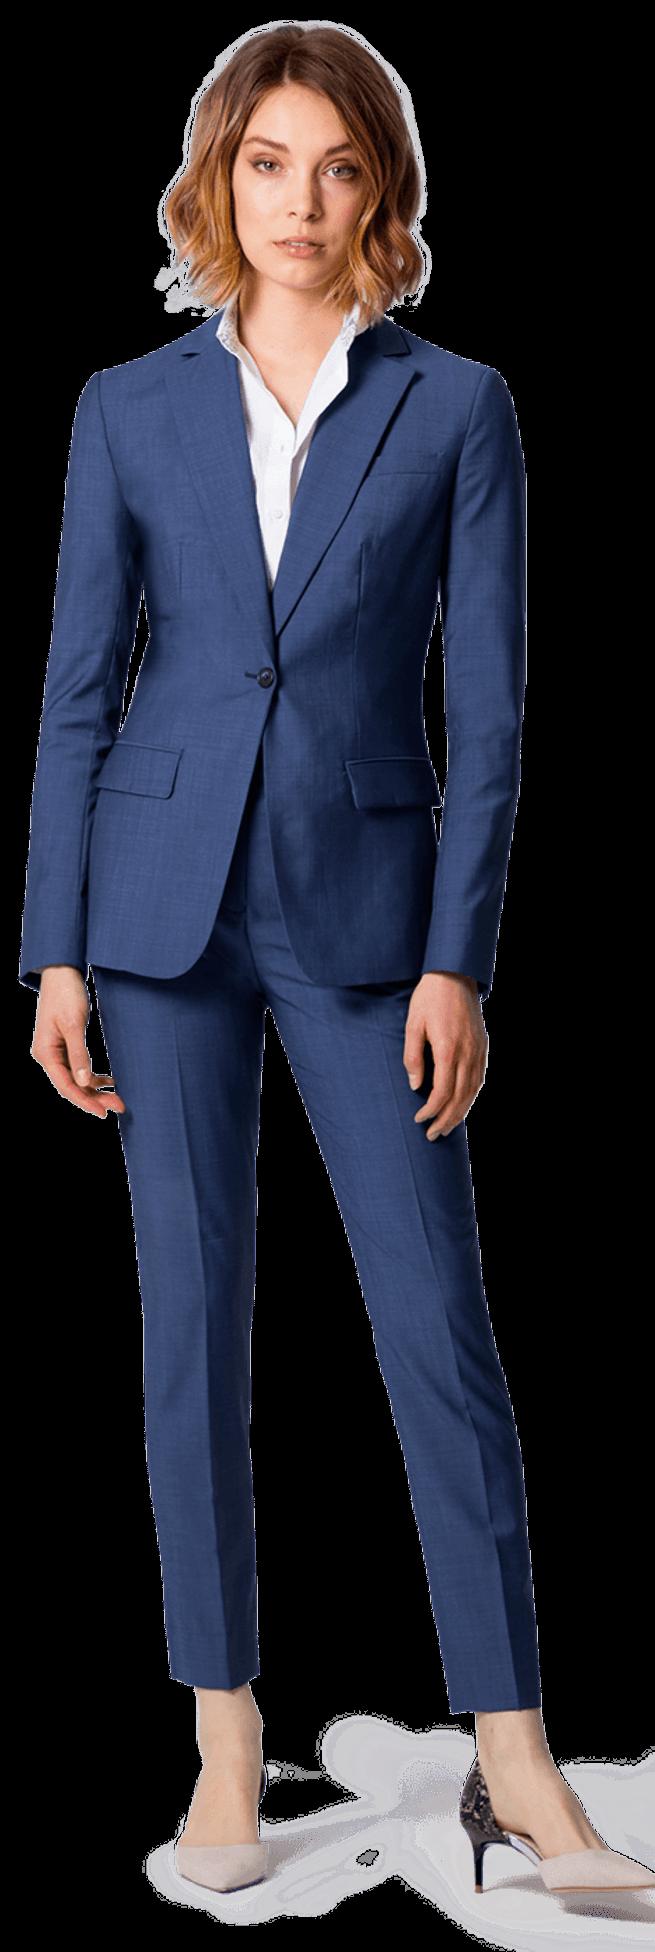 Linen Pants for women CLASSIC Linen Trousers for women Linen Pants Midnight blue color pants